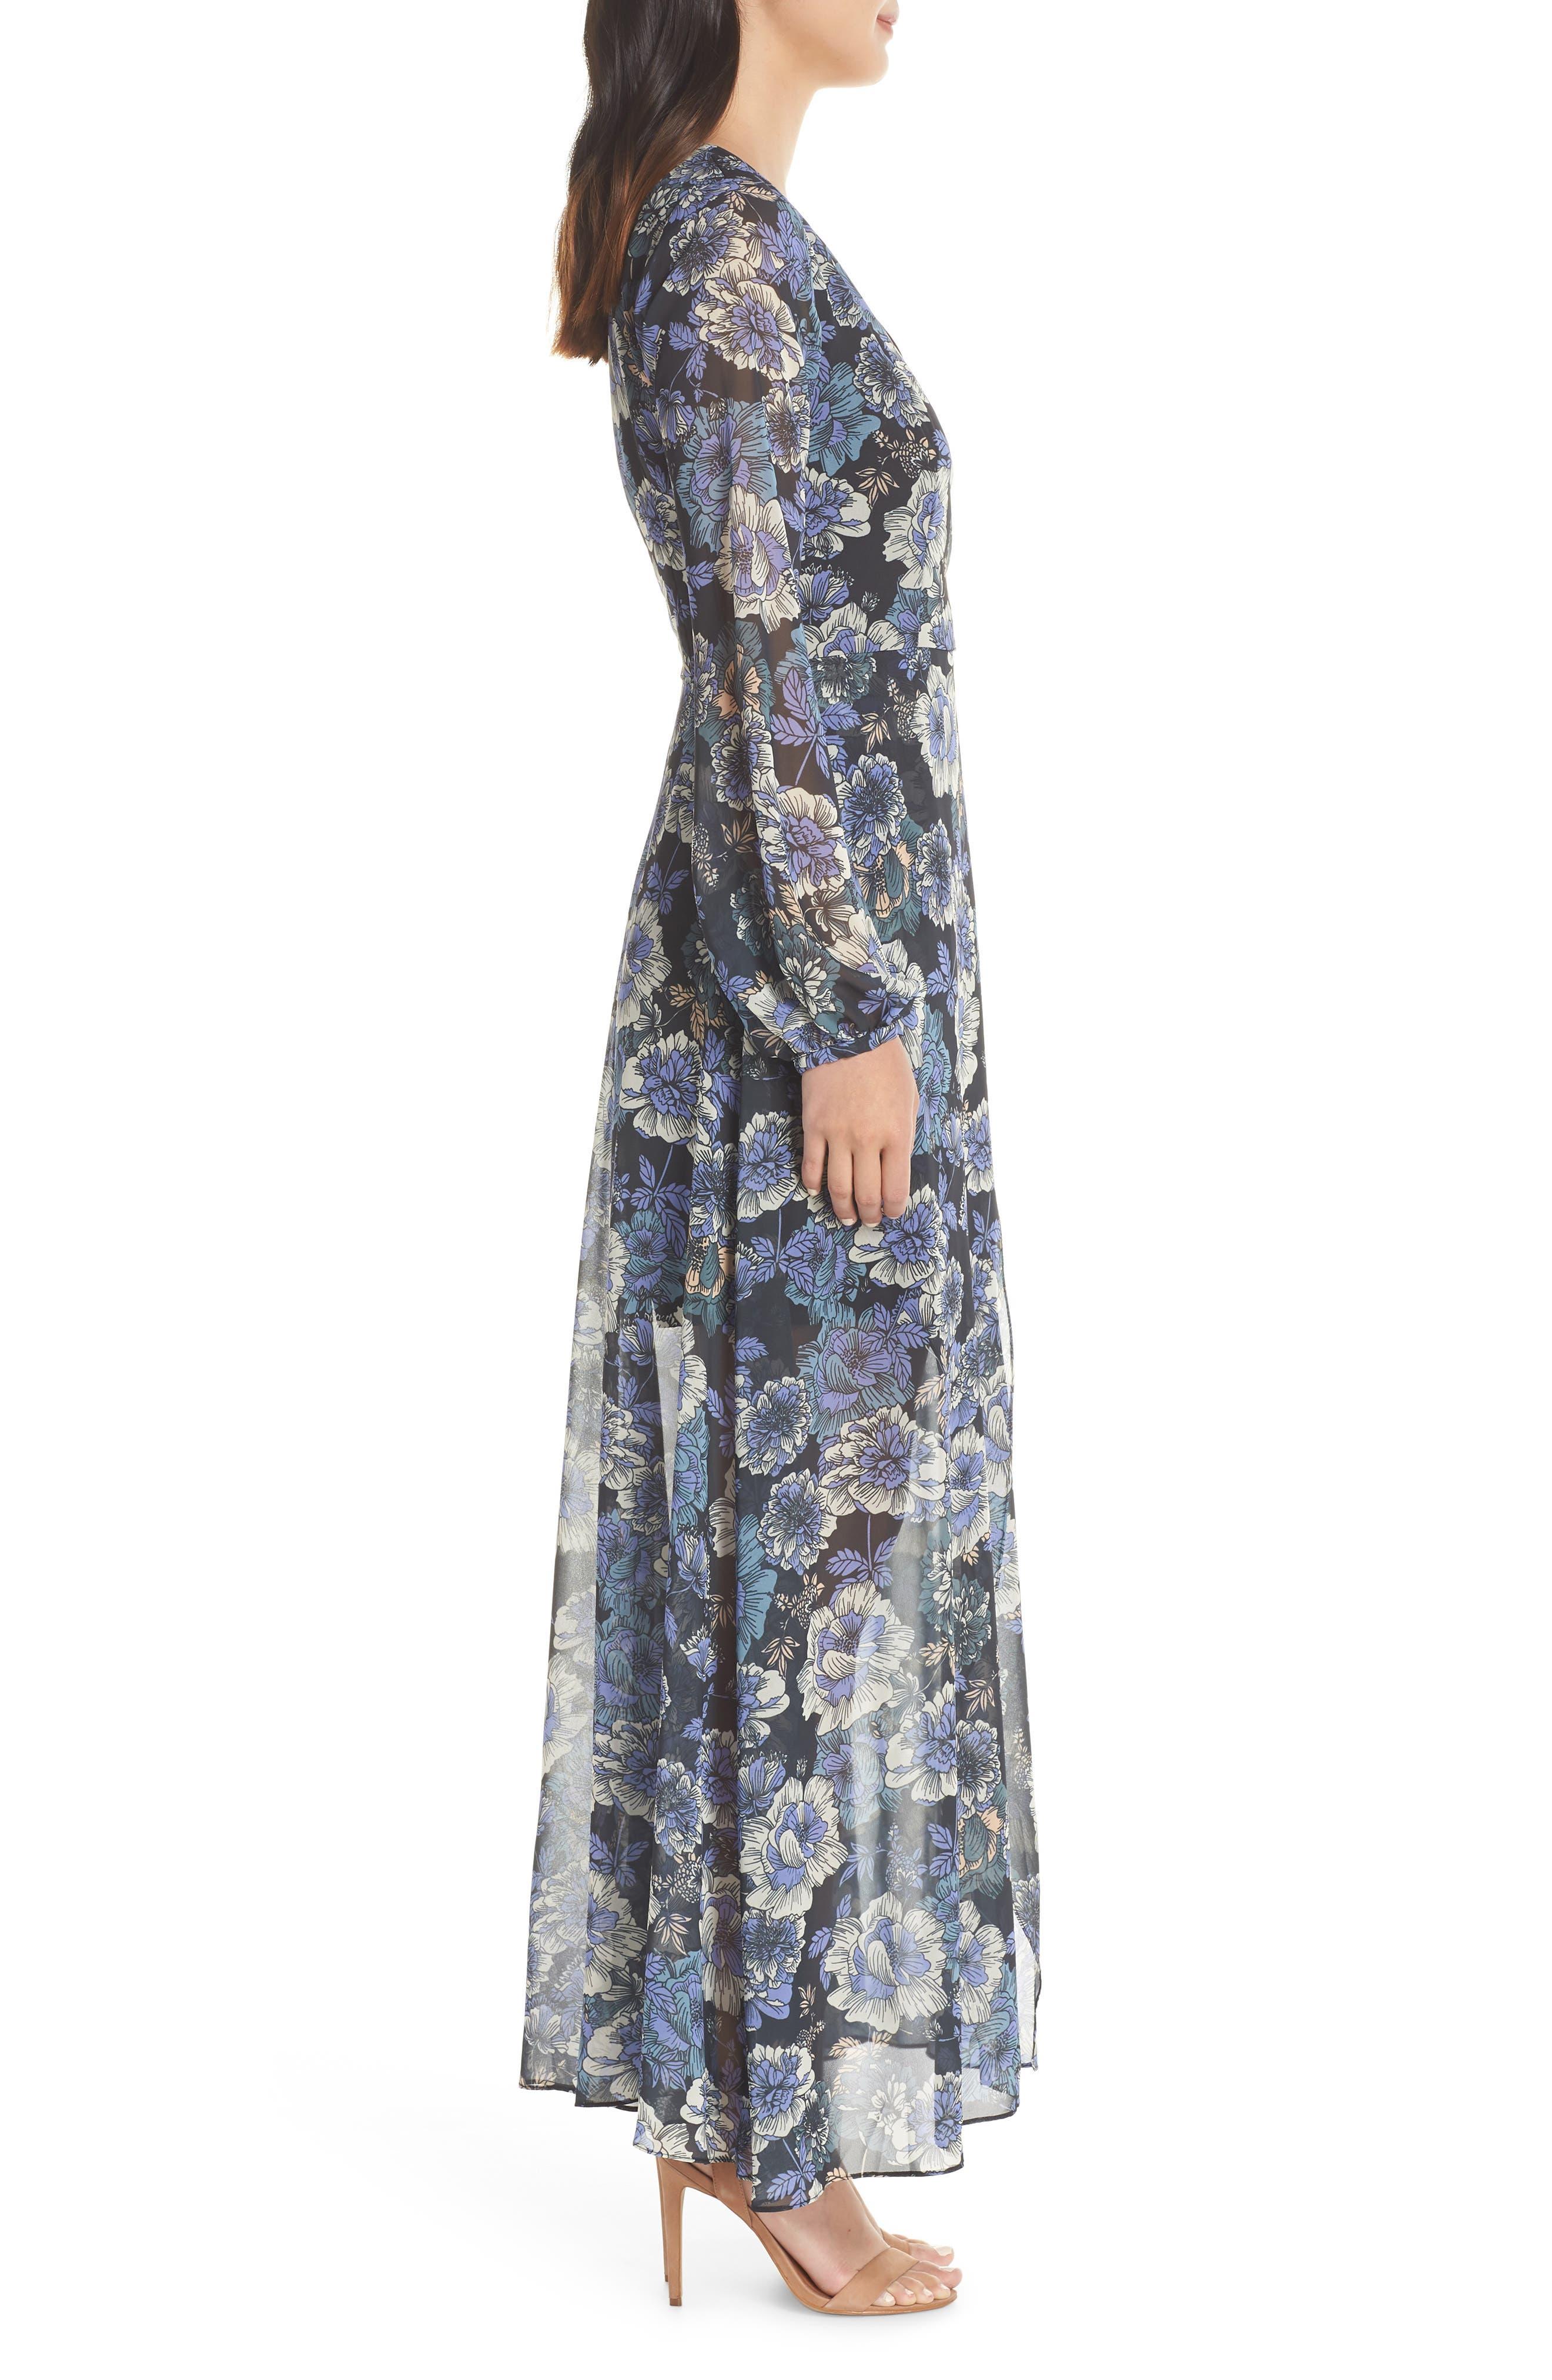 COOPER ST,                             Floral Fantasy Maxi Dress,                             Alternate thumbnail 4, color,                             PRINT